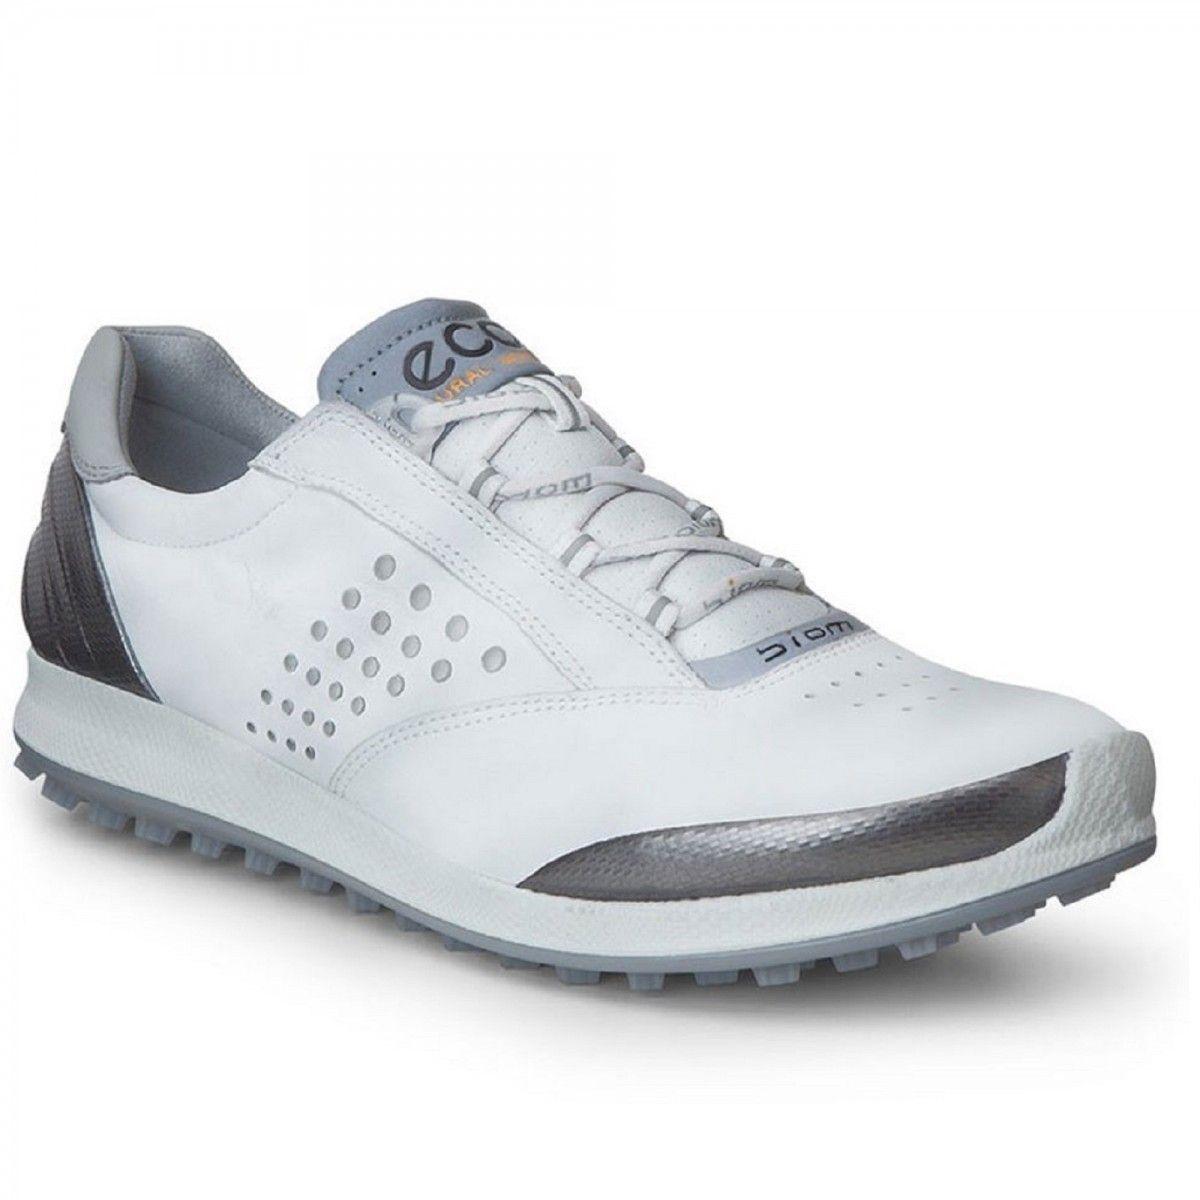 ecco womens biom hybrid 2 golf shoes